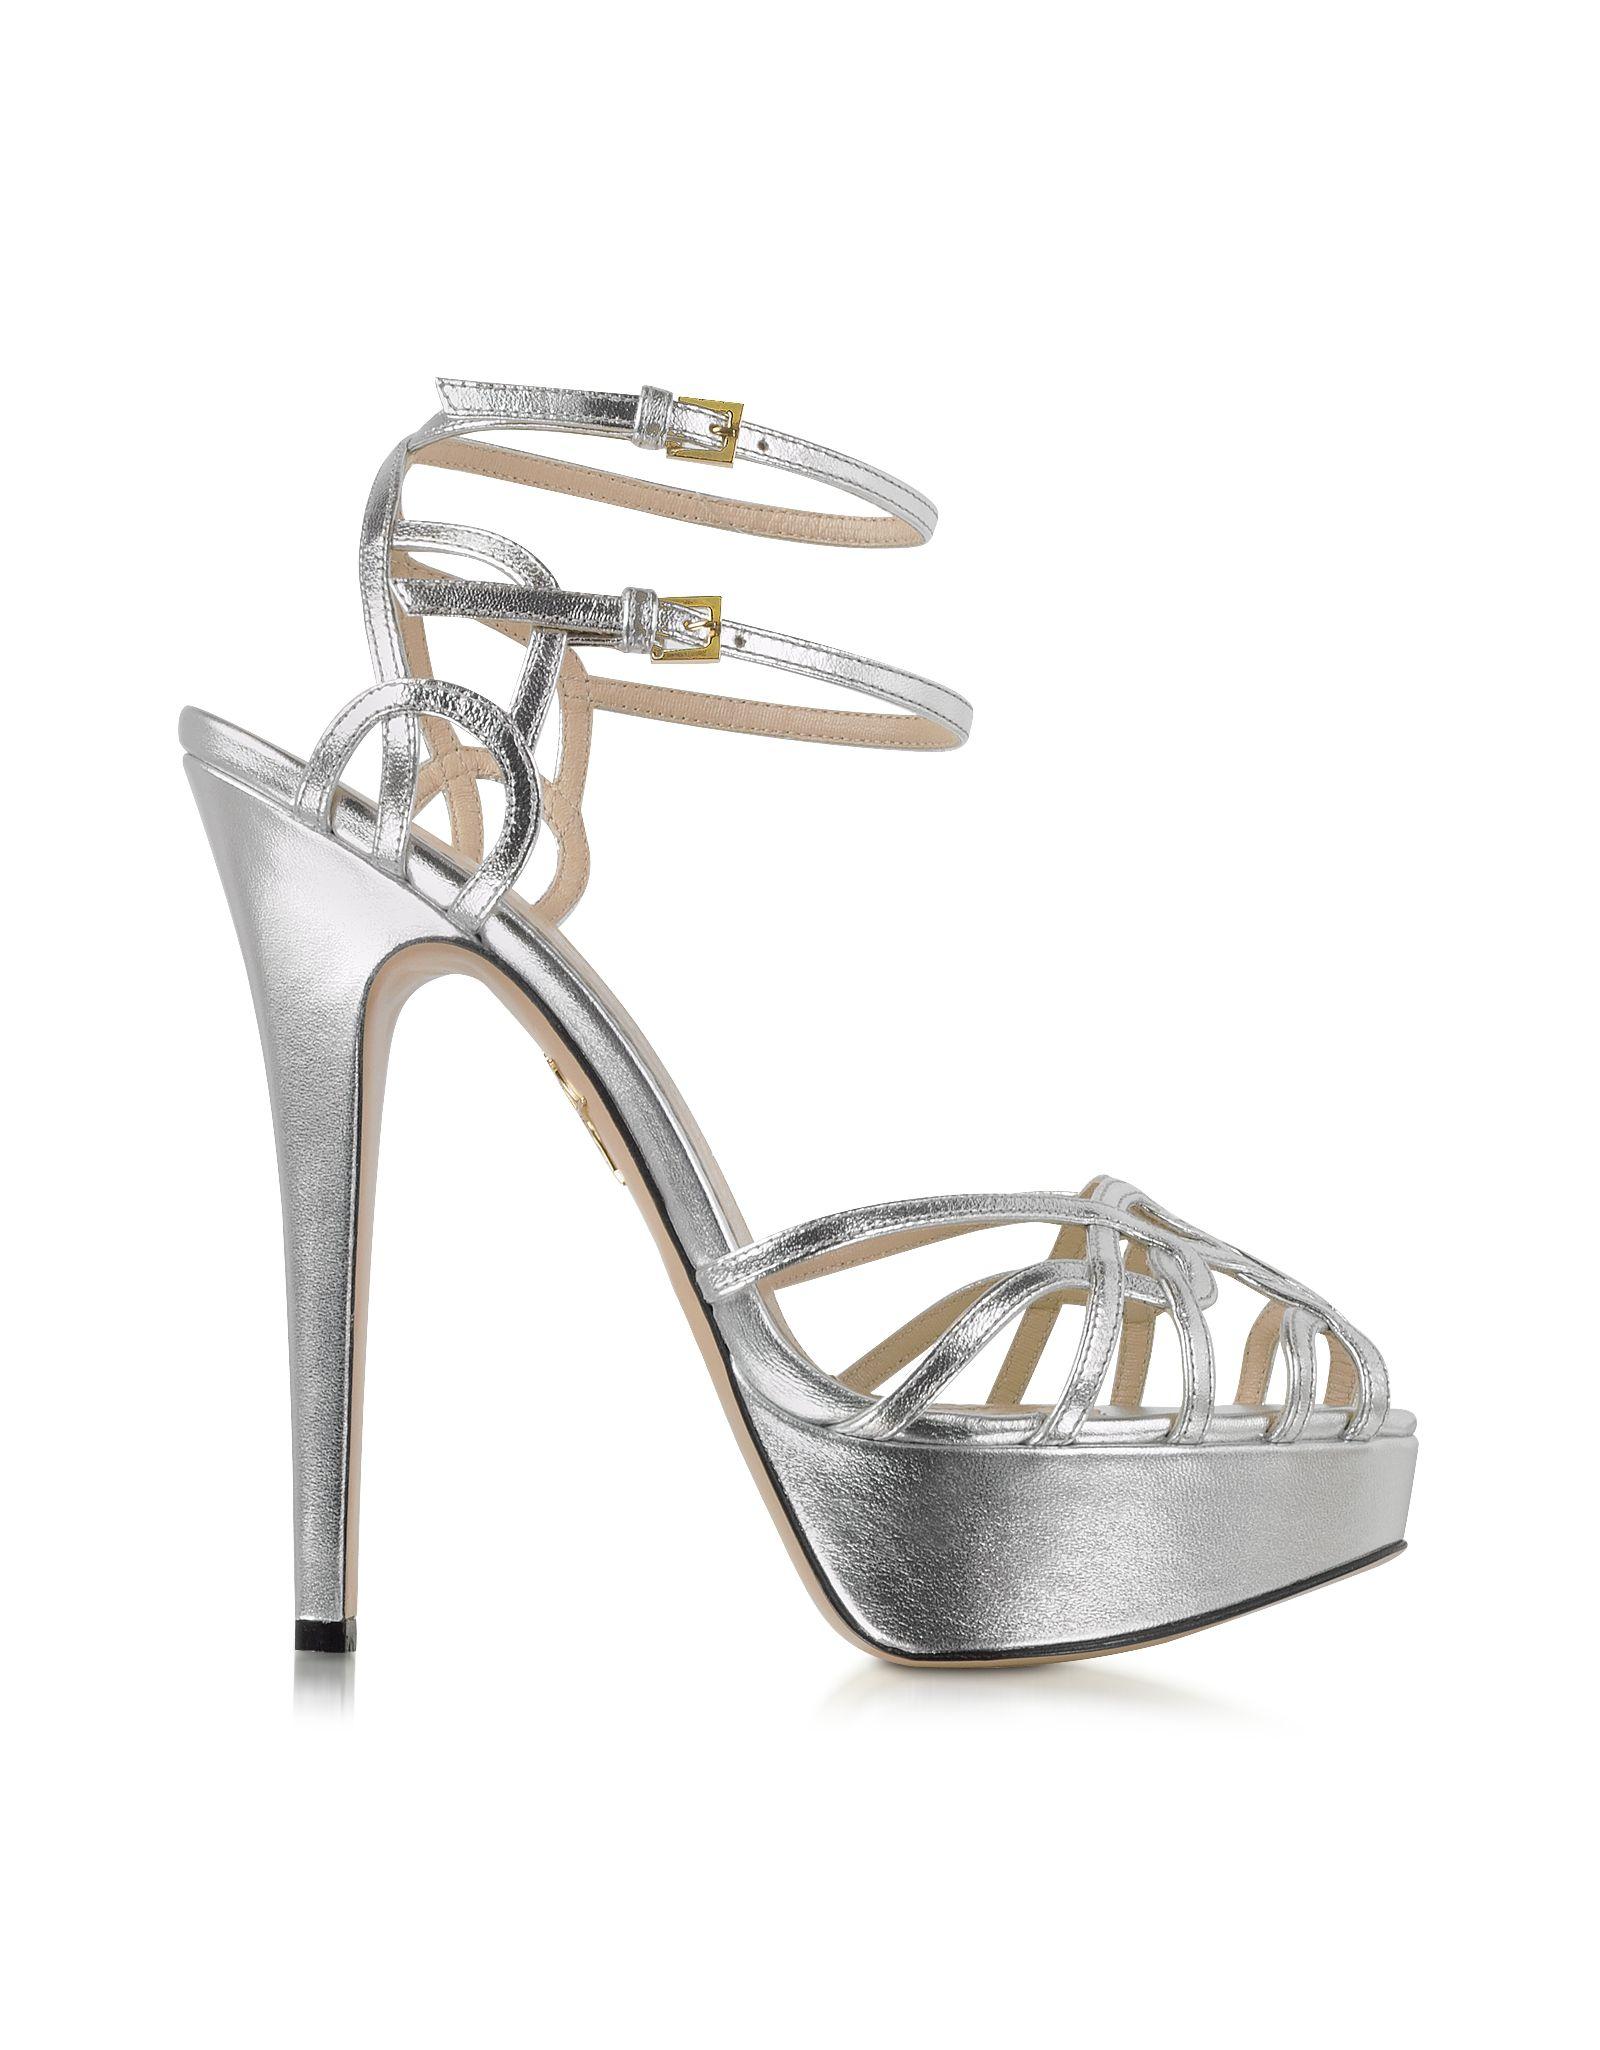 Charlotte Olympia Ursula Silver Metallic Platform Sandal 37 (7 US   4 UK   37 EU) at FORZIERI